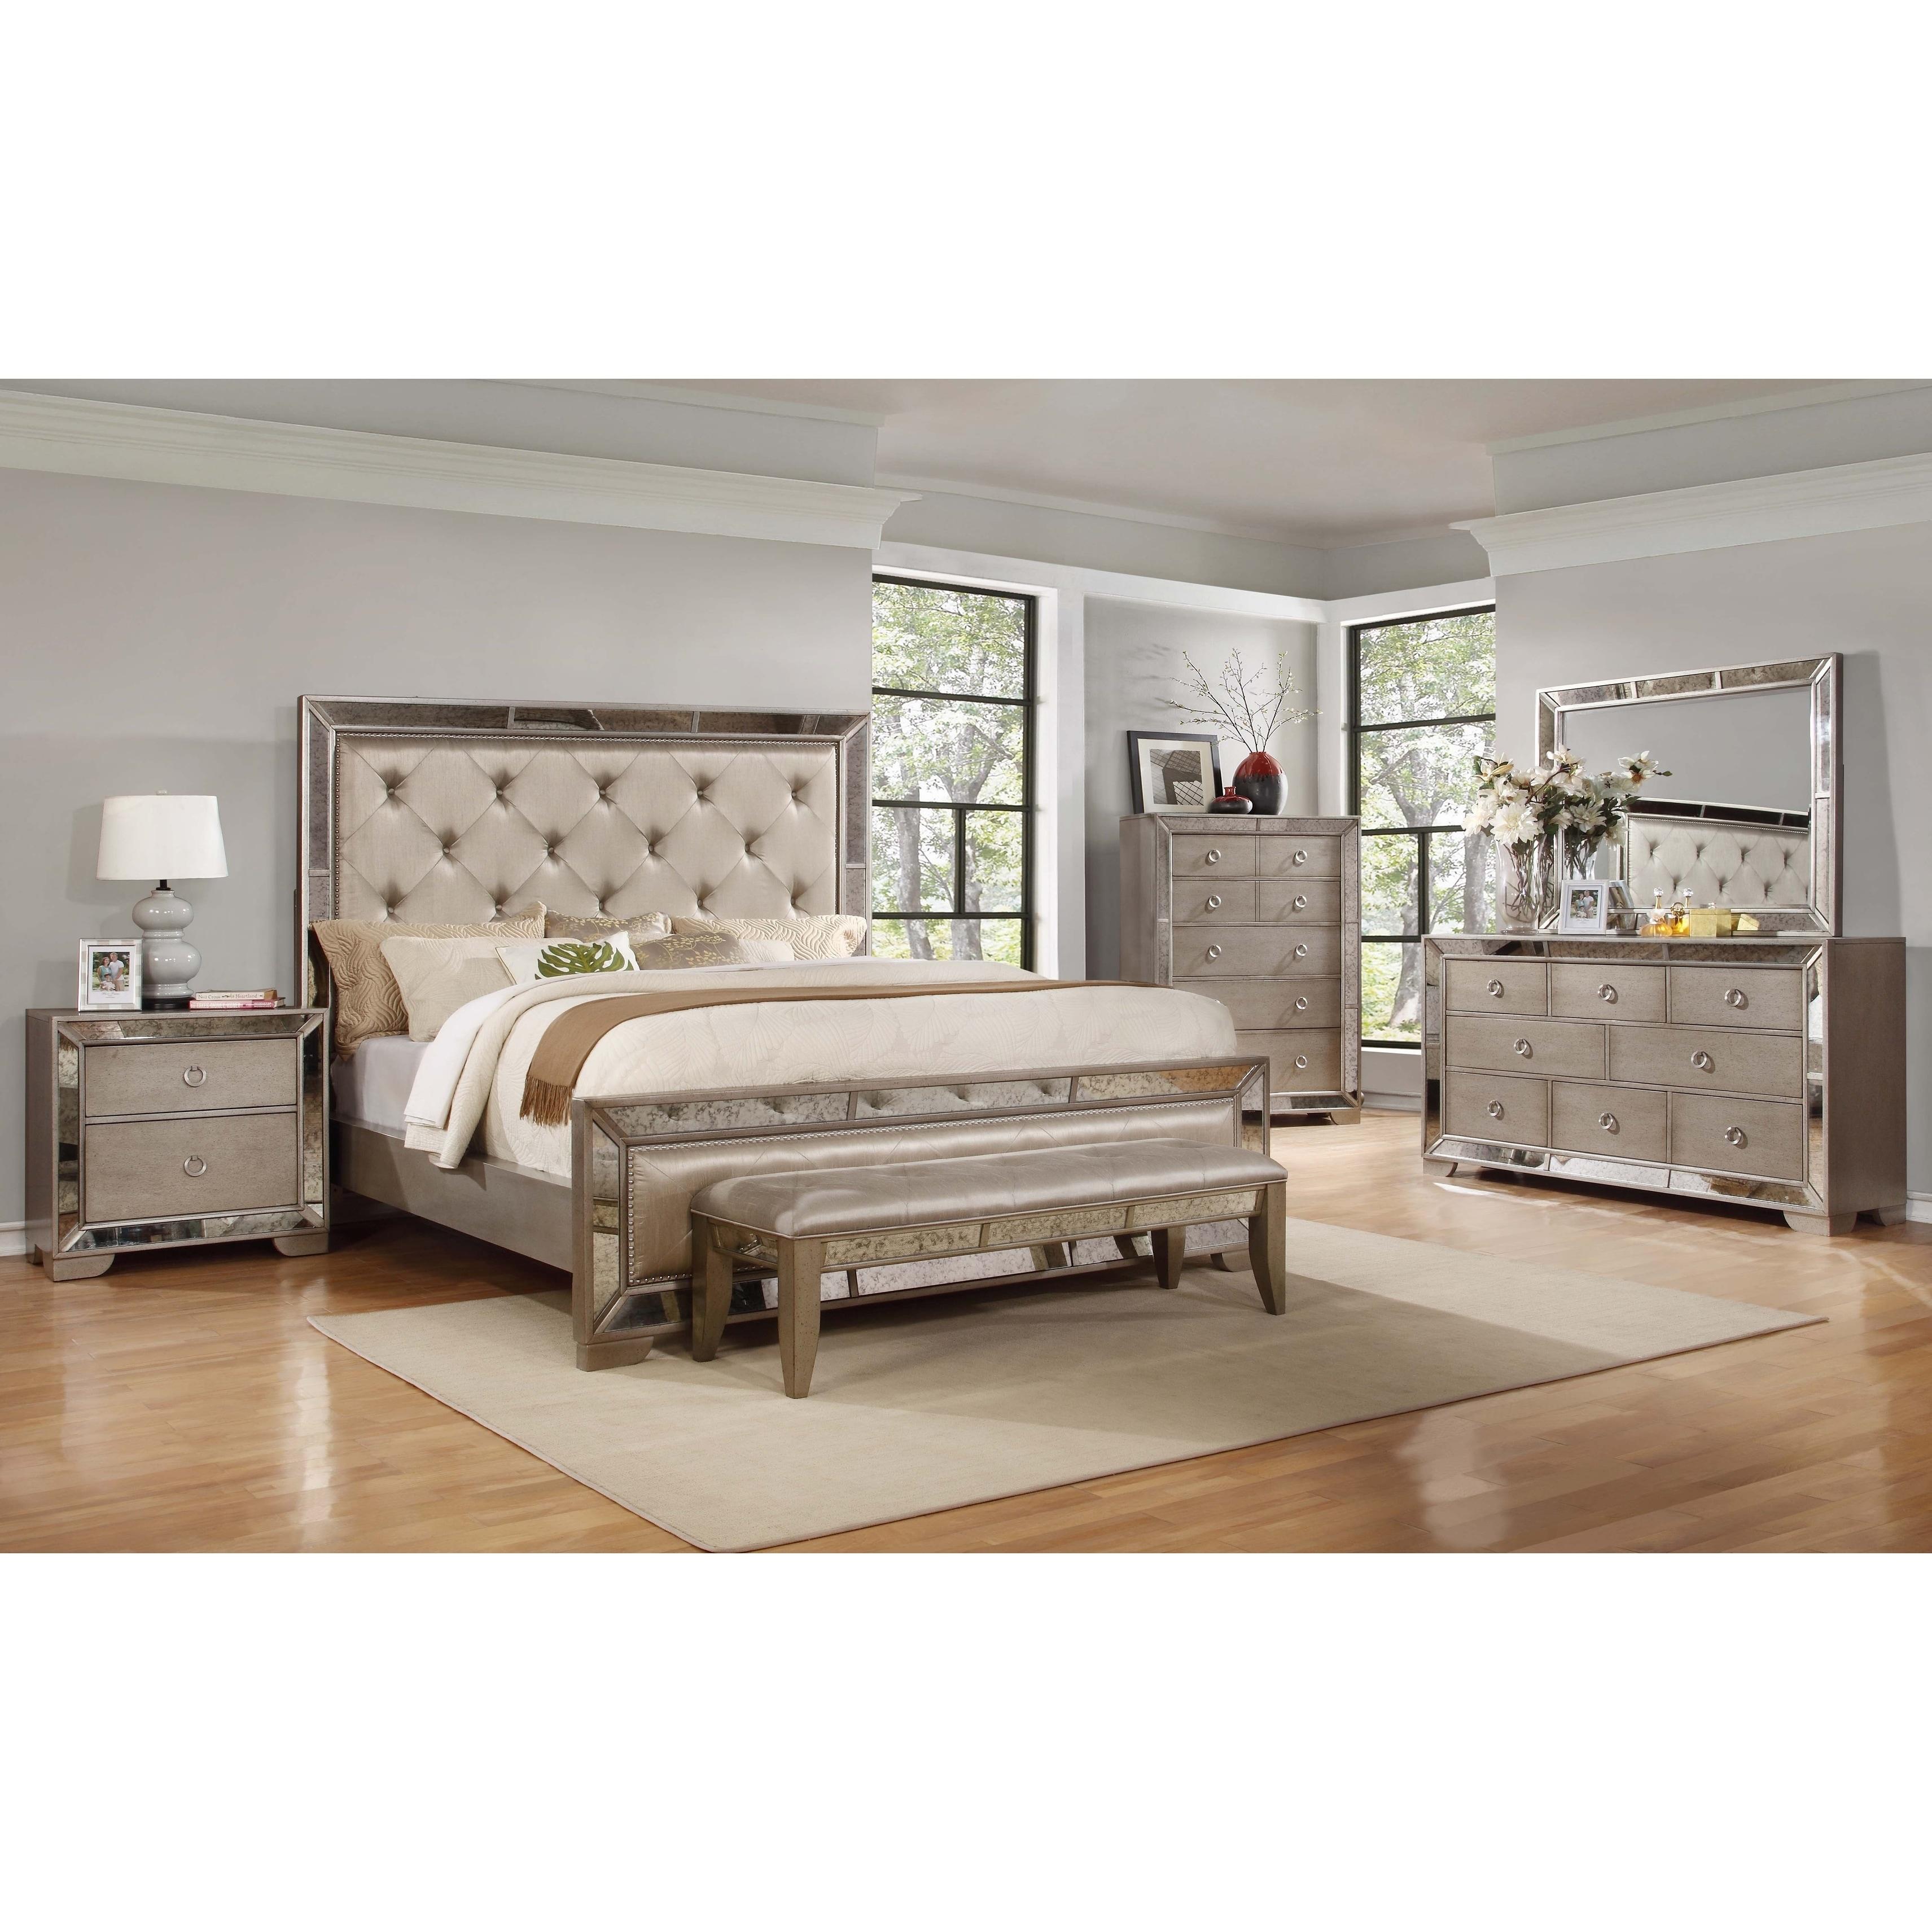 Best Master Furniture Ava 10-piece Bedroom Set